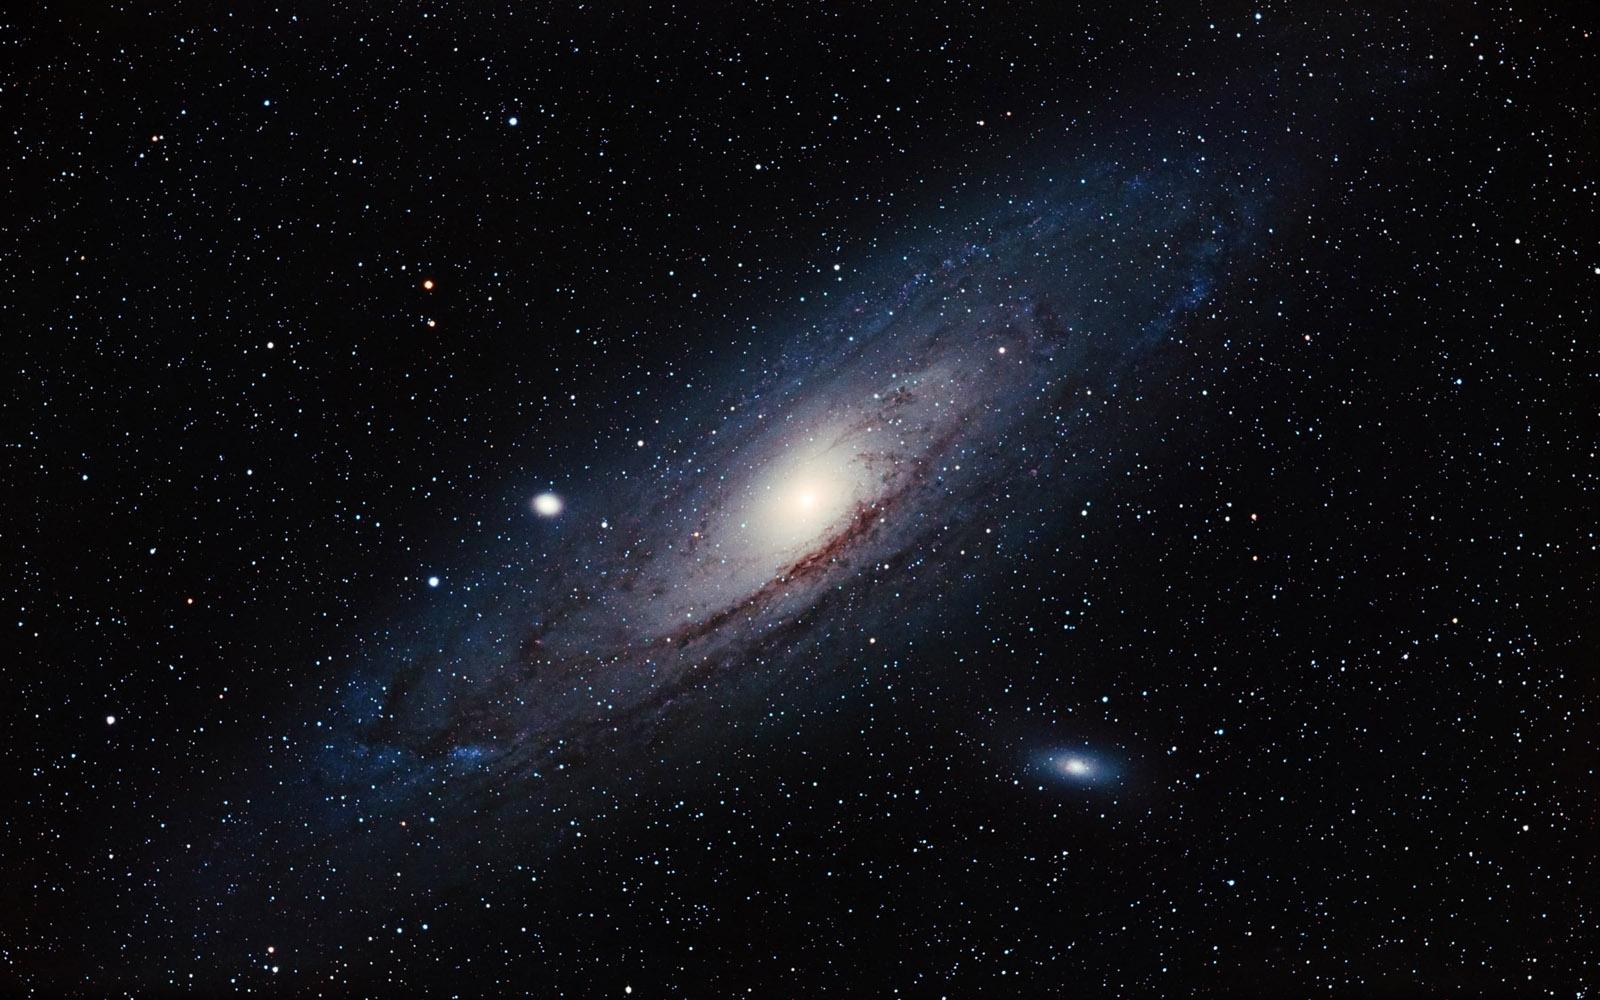 andromeda galaxy wallpapers, 38 andromeda galaxy images for free